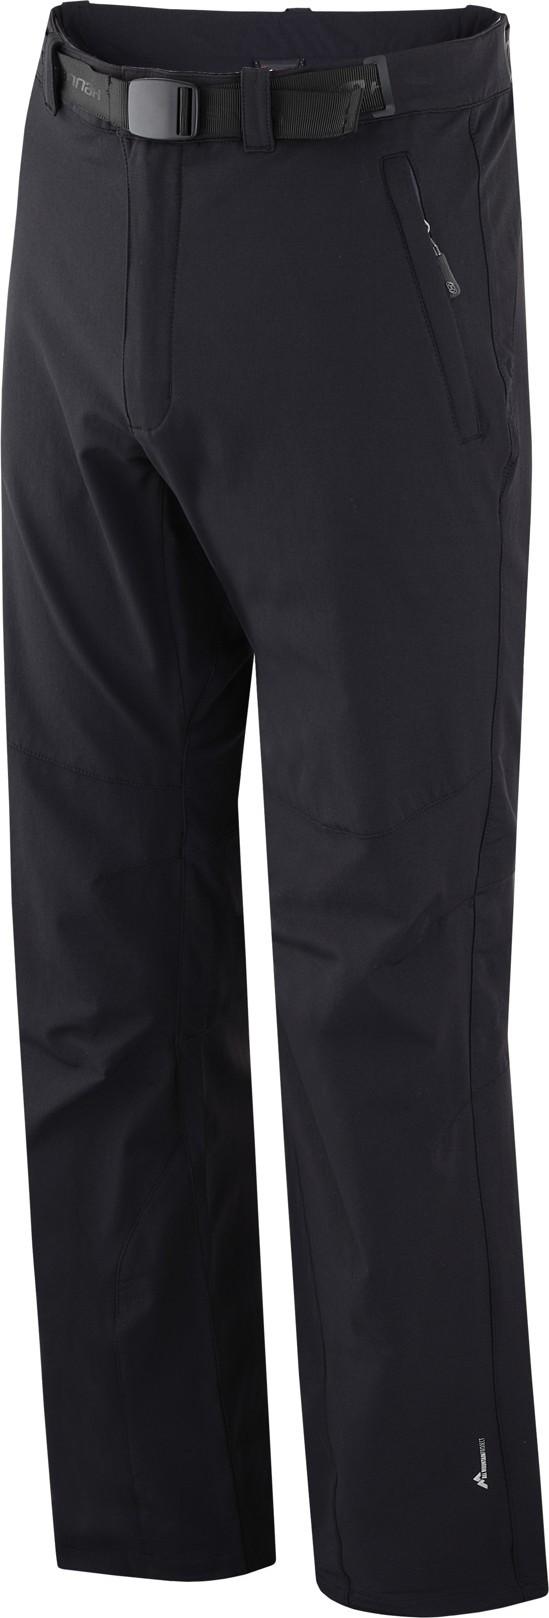 Hannah Enduro anthracite Velikost: L kalhoty